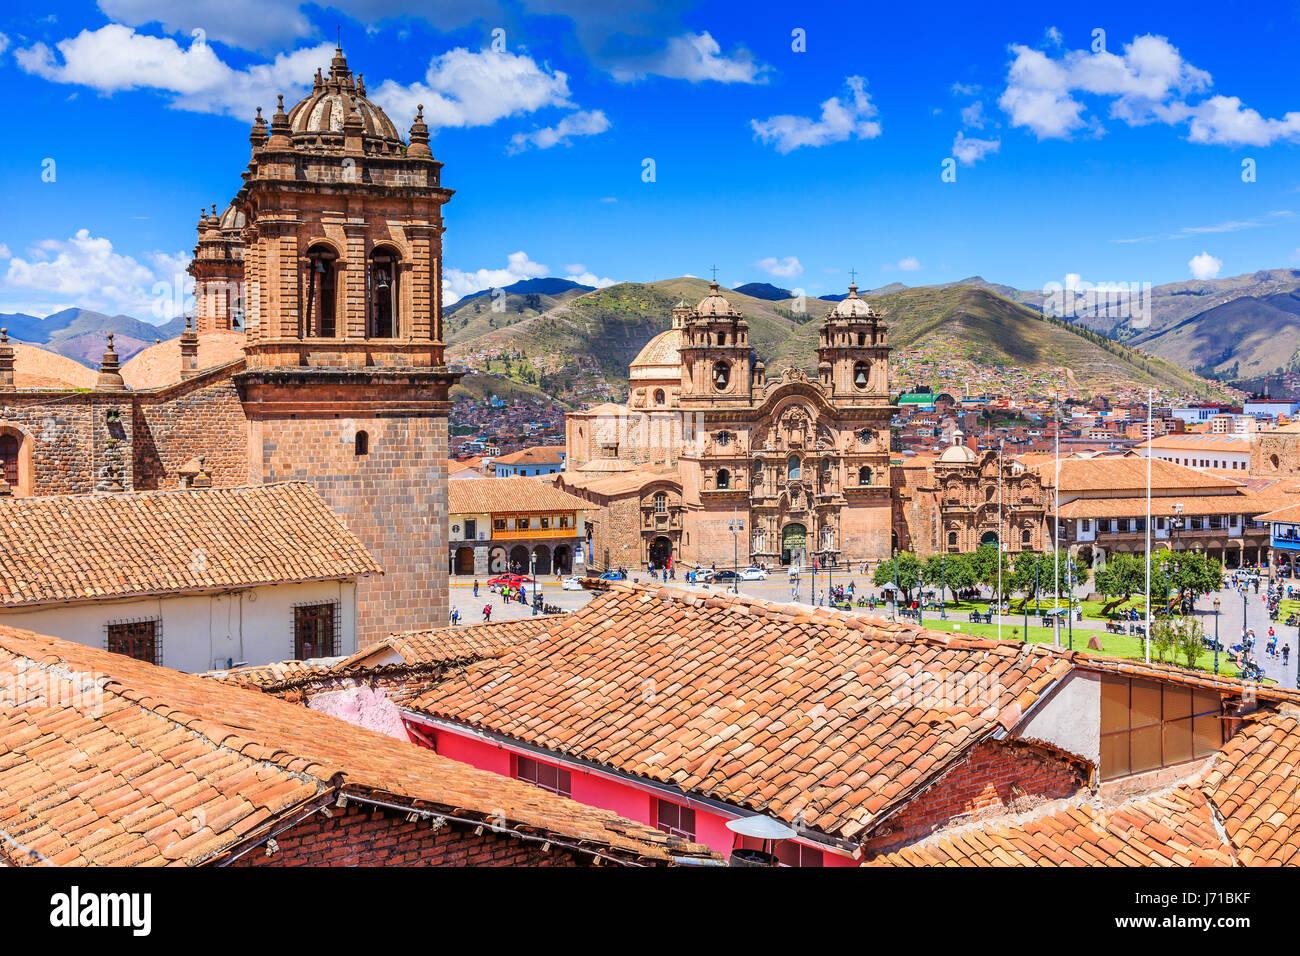 Cusco, Peru the historic capital of the Inca Empire. Plaza de Armas. - Stock Image